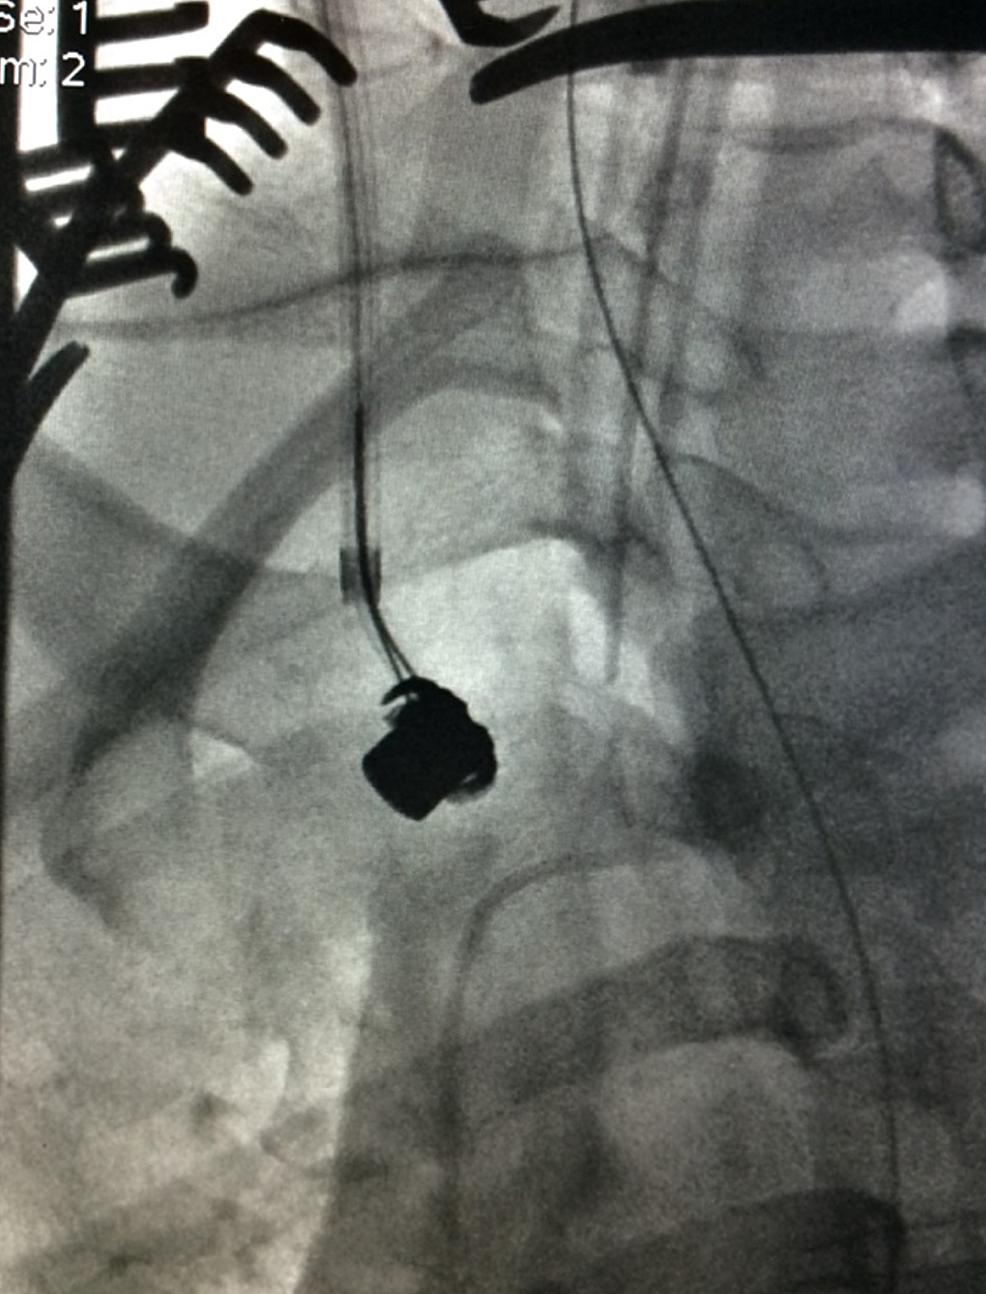 Ascent-of-Snared-Bullet-Embolus-on-Fluoroscopy